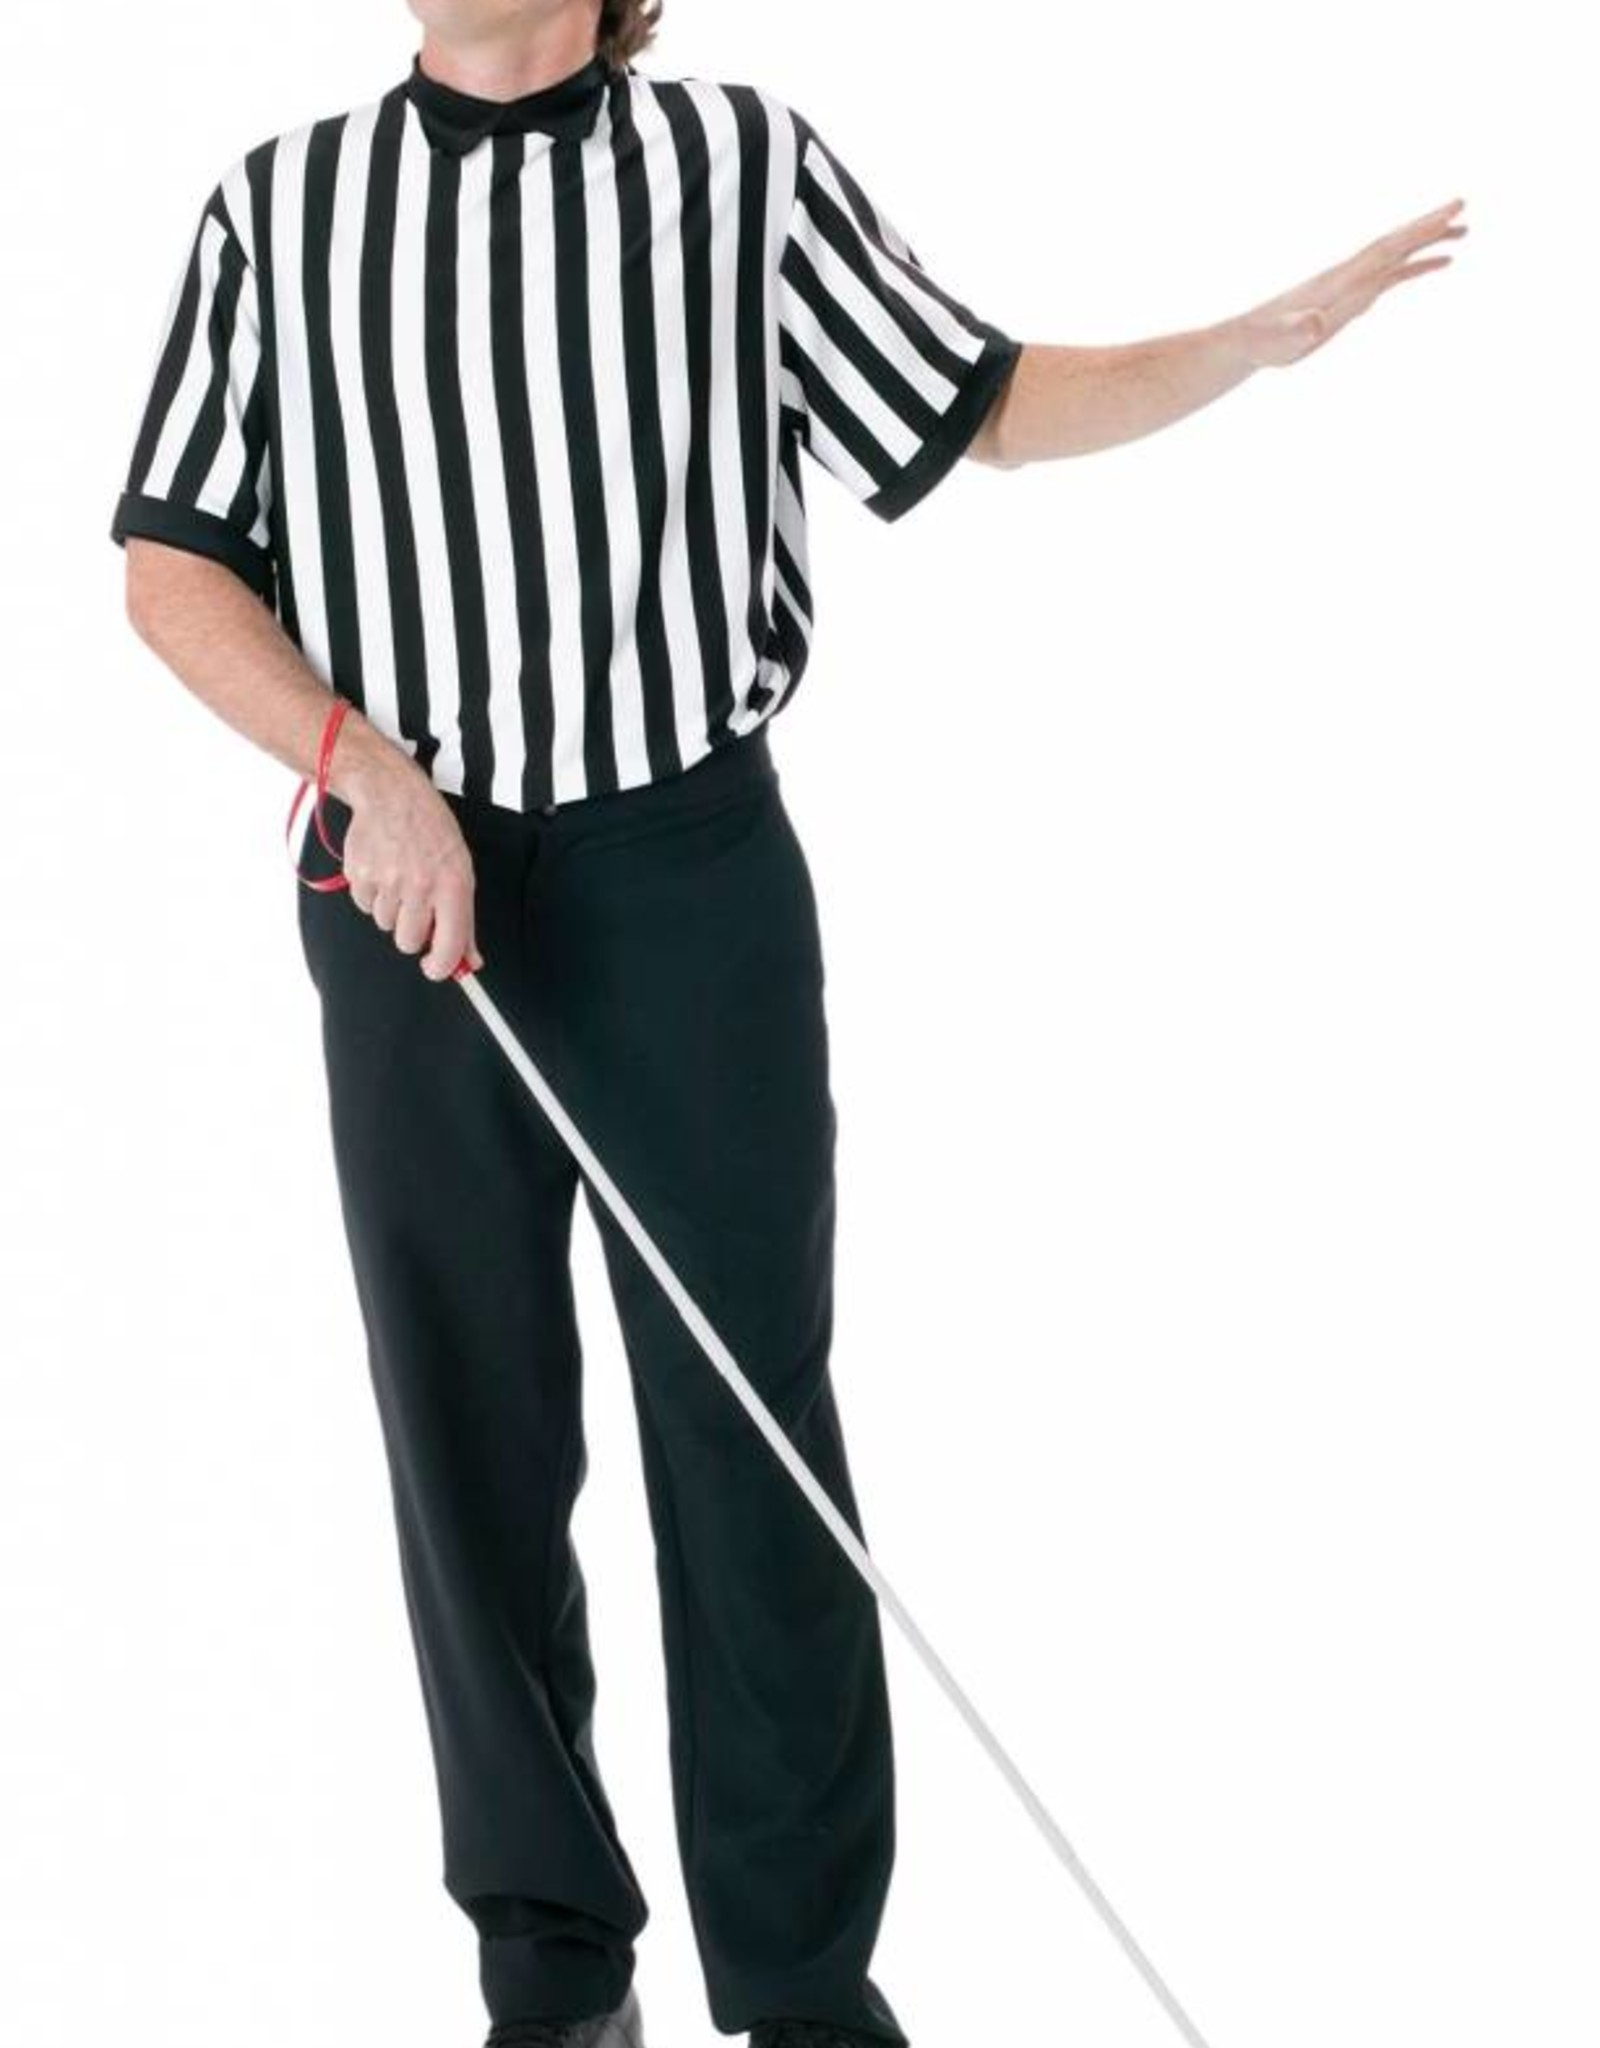 Blind Referee Kit